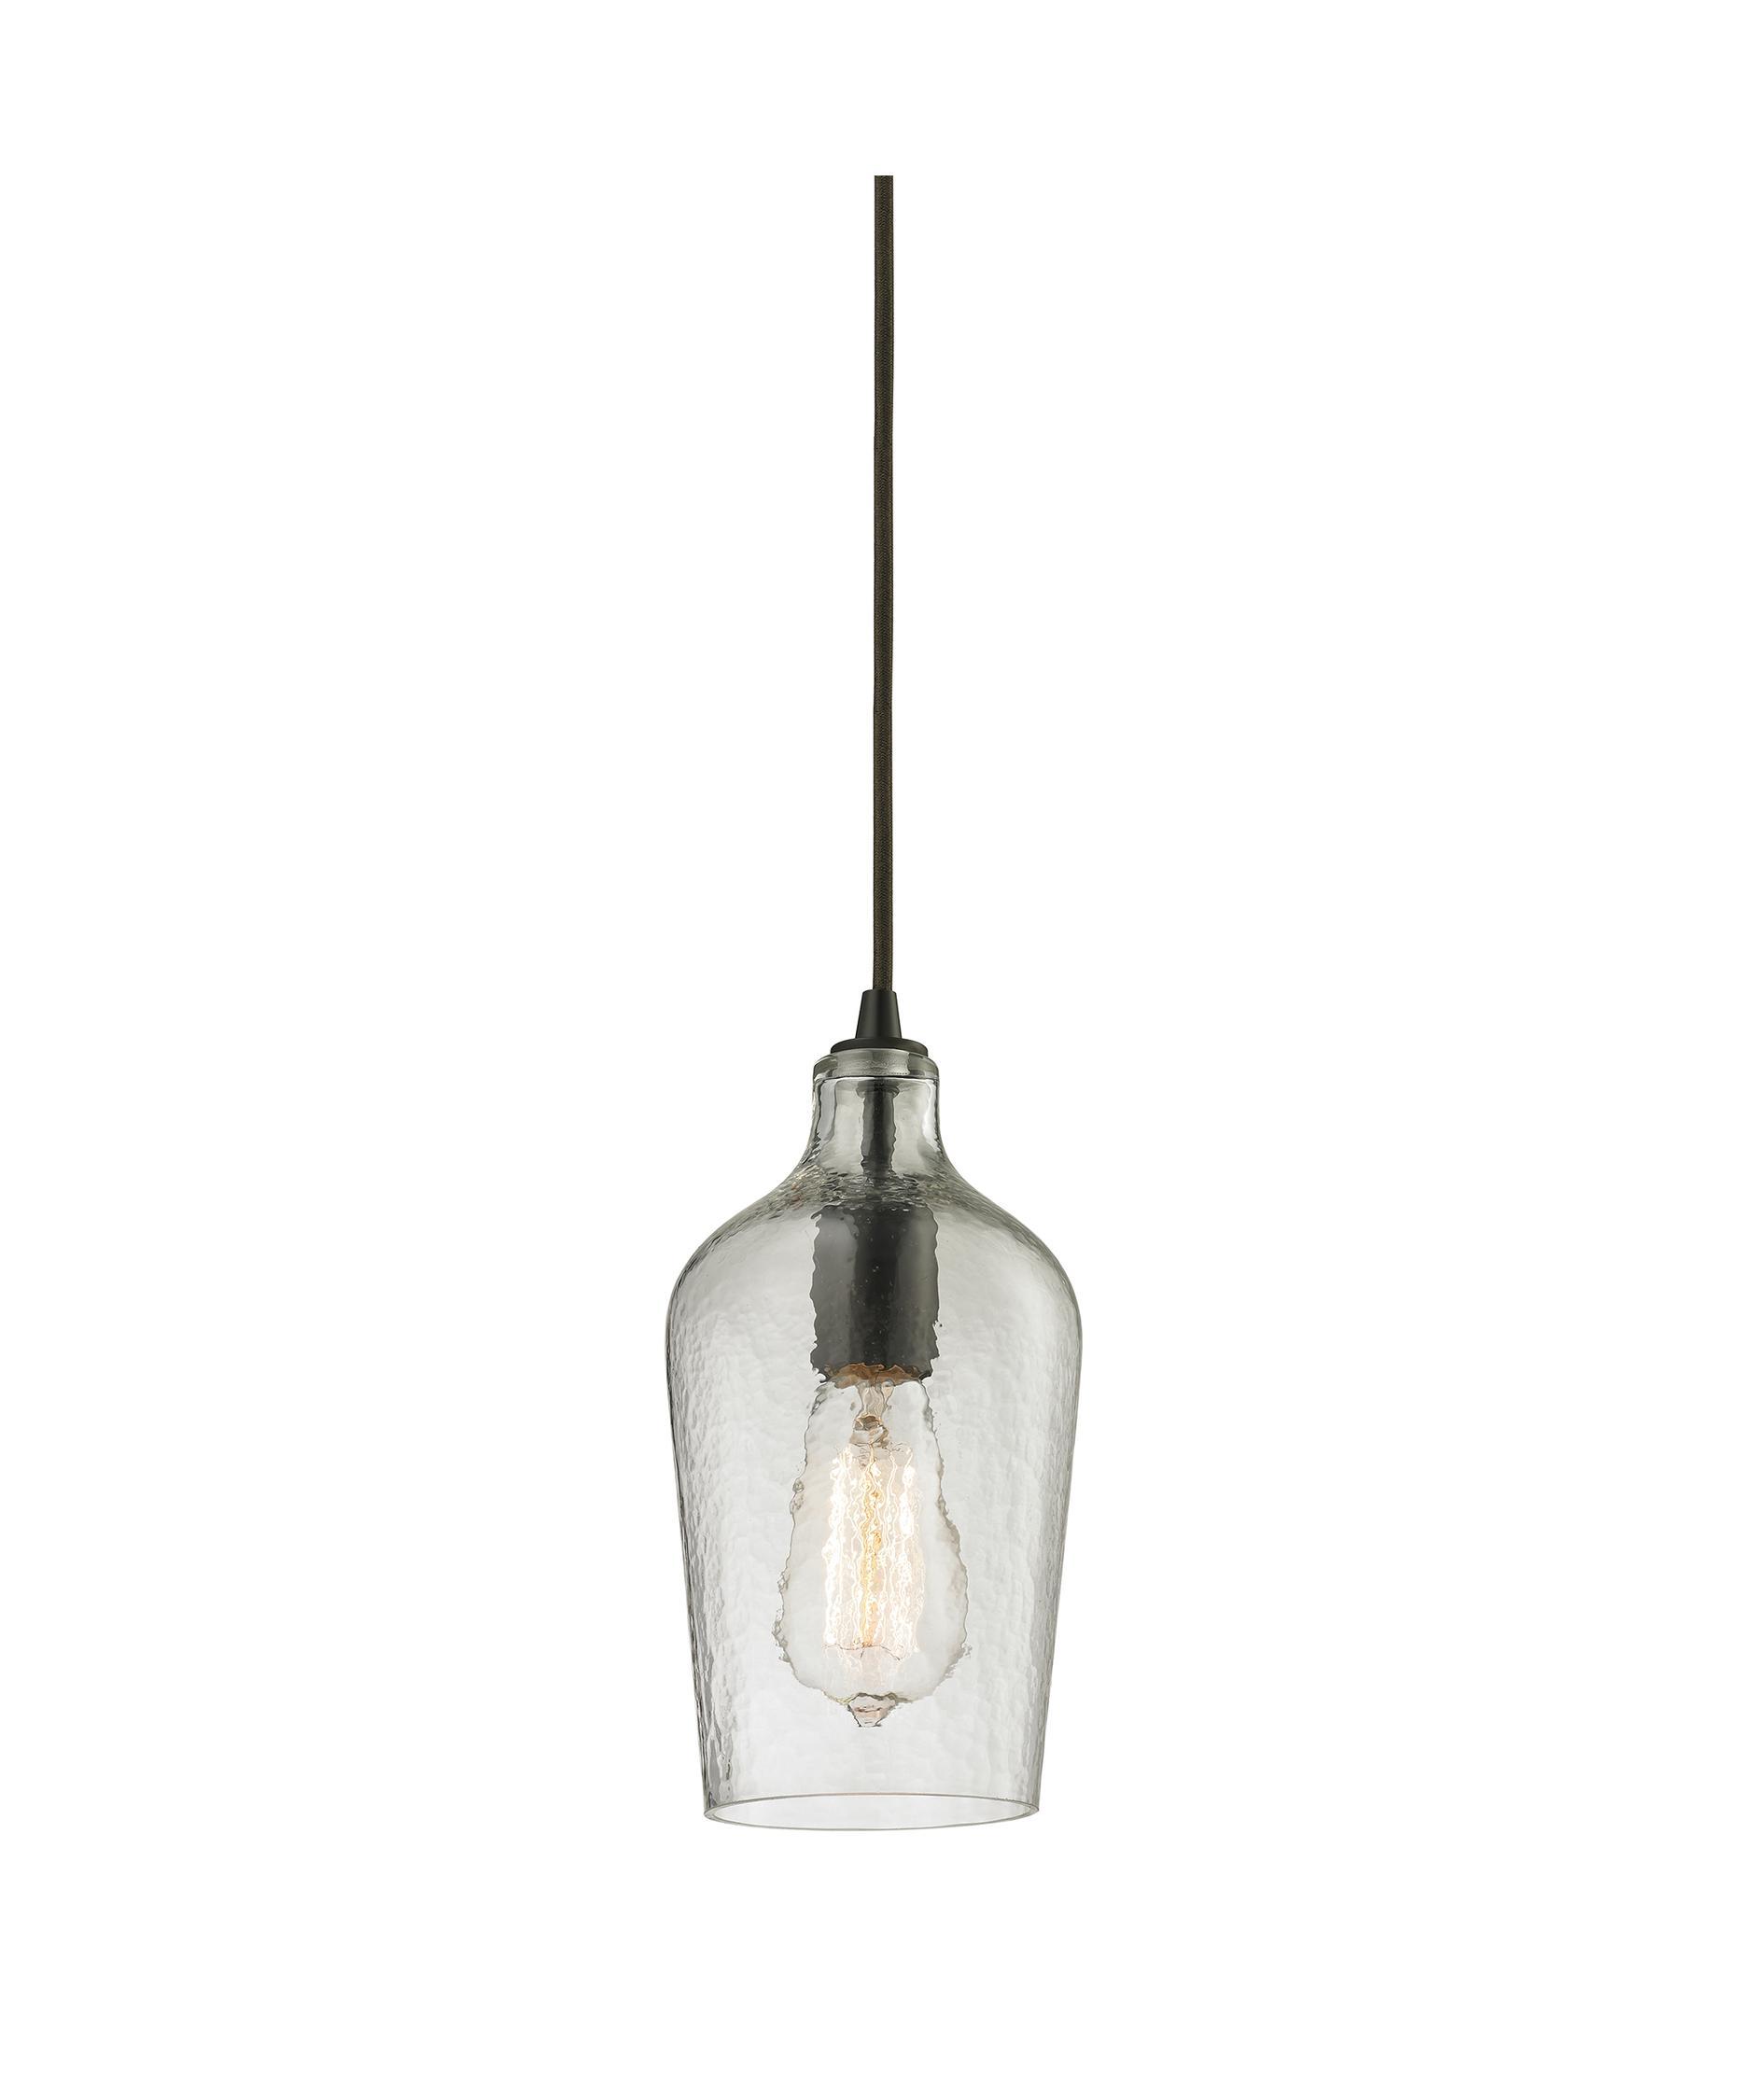 ELK Lighting 10331 1 Hammered Glass 2 Inch Wide 1 Light Mini Pendant |  Capitol Lighting 1 800lighting.com